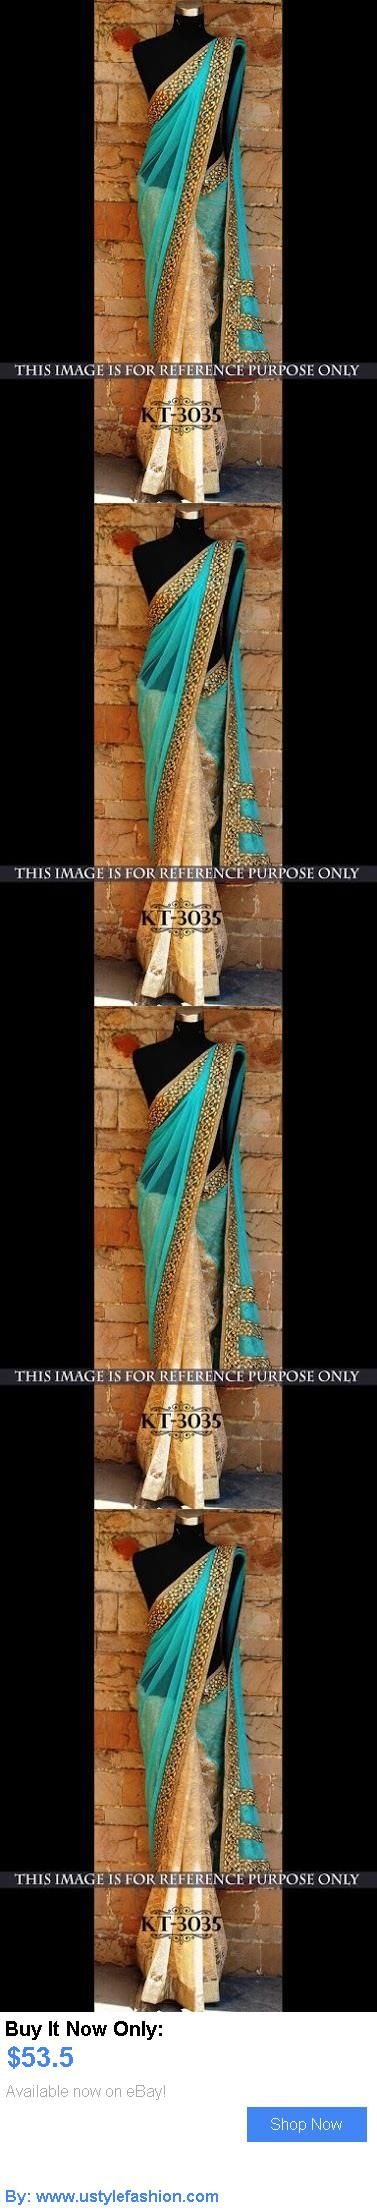 Cultural and ethnic clothing: Designer Party Wear Wedding Indian Pakistani Saree Sari Bollywood Ethnic Lehenga BUY IT NOW ONLY: $53.5 #ustylefashionCulturalandethnicclothing OR #ustylefashion